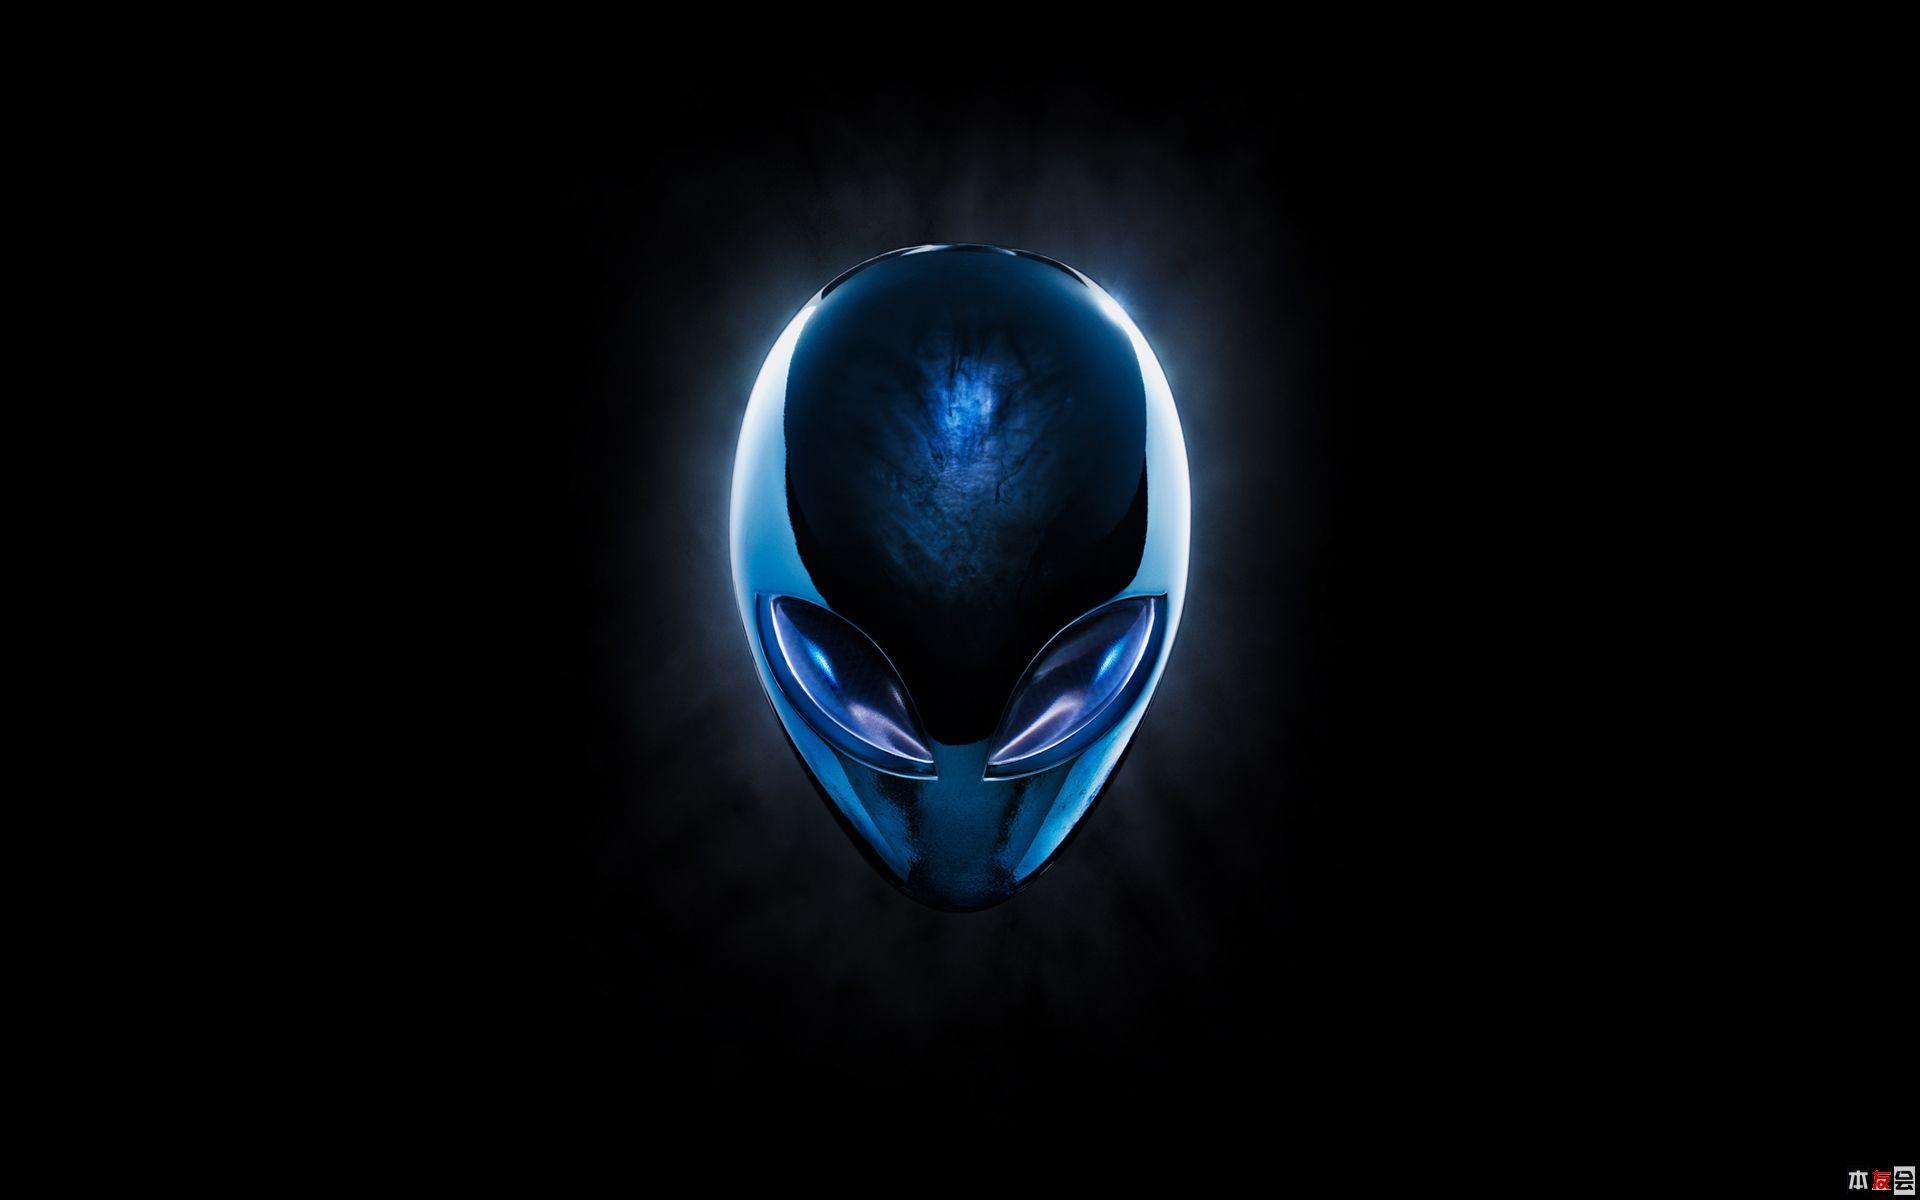 外星人背景贴图_戴尔alienware外星人论坛